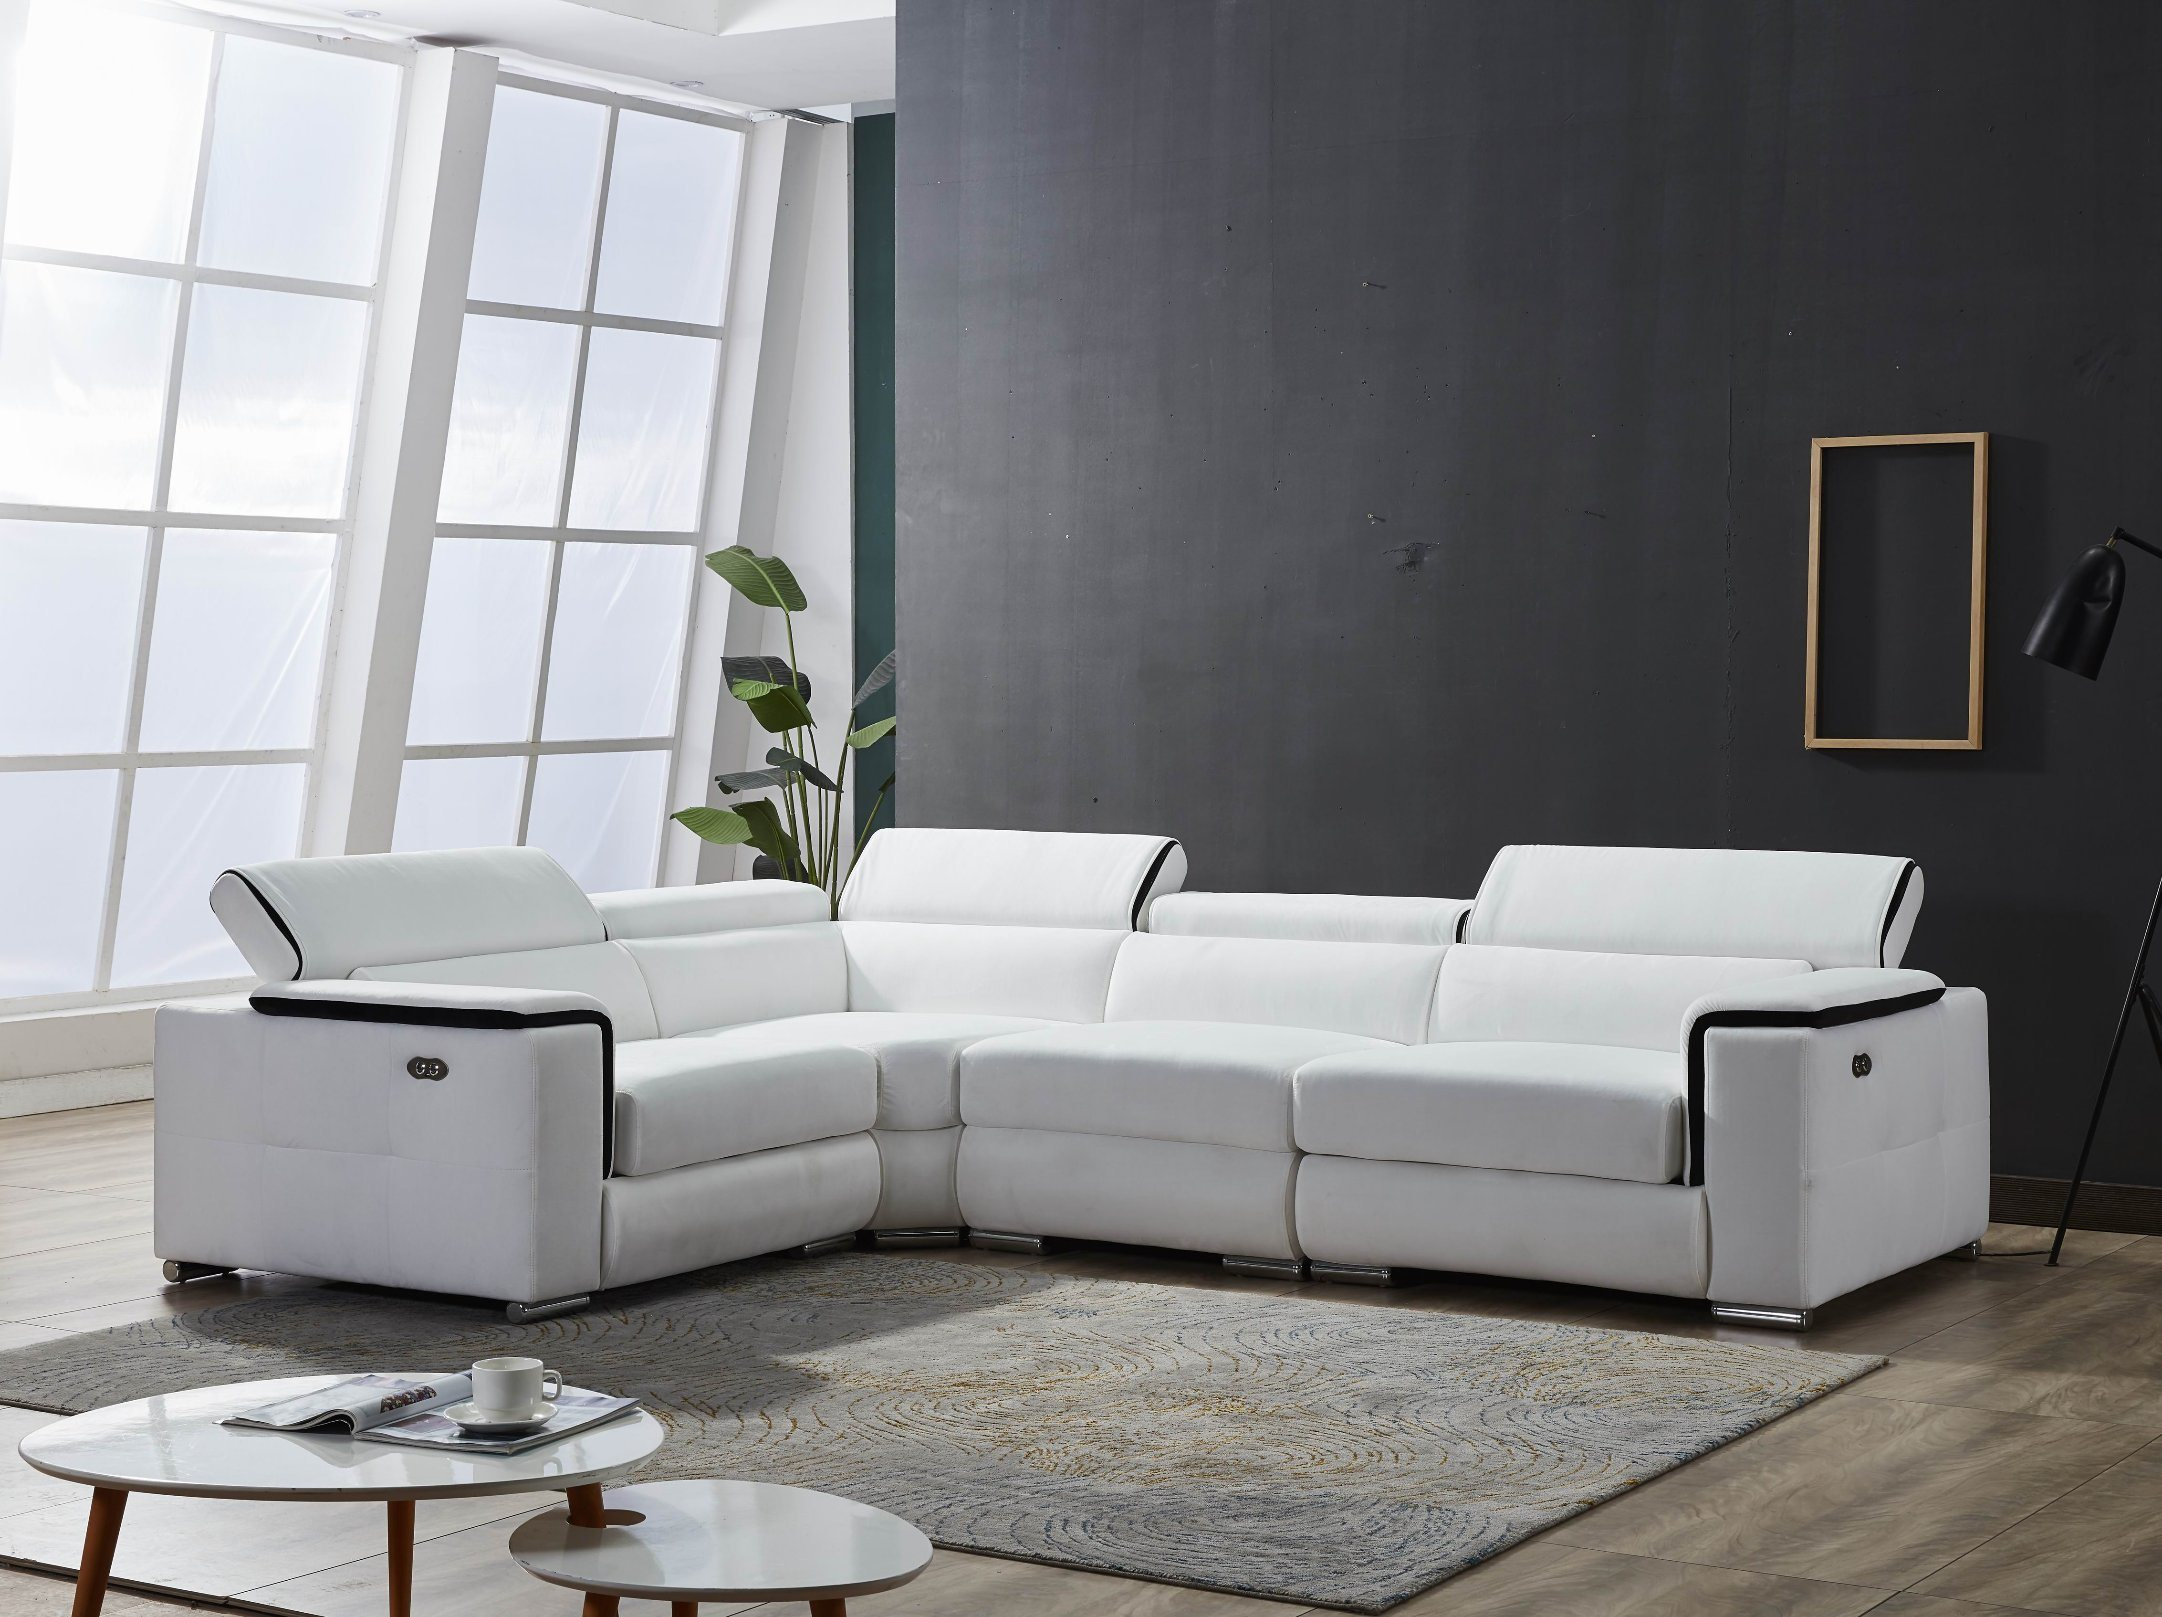 Hot Item Contemporary Design Fabric Sofa Furniture Sofa Contemporary Italian Style European Style Furniture